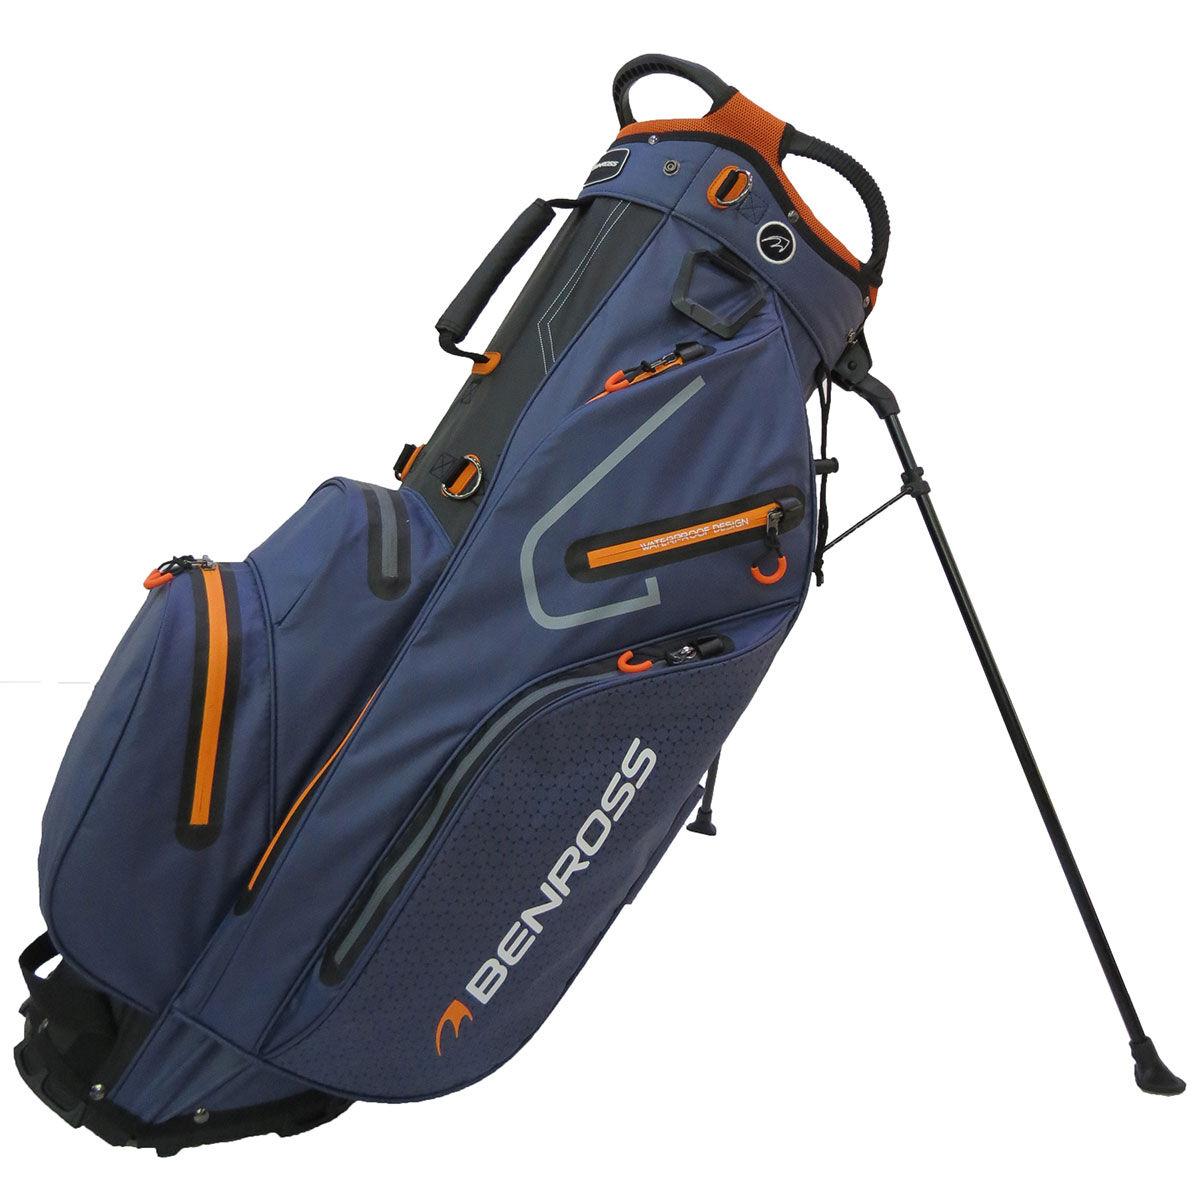 Sac trépied imperméable Benross PROTEC 2.0, homme, Navy/black/orange    Online Golf